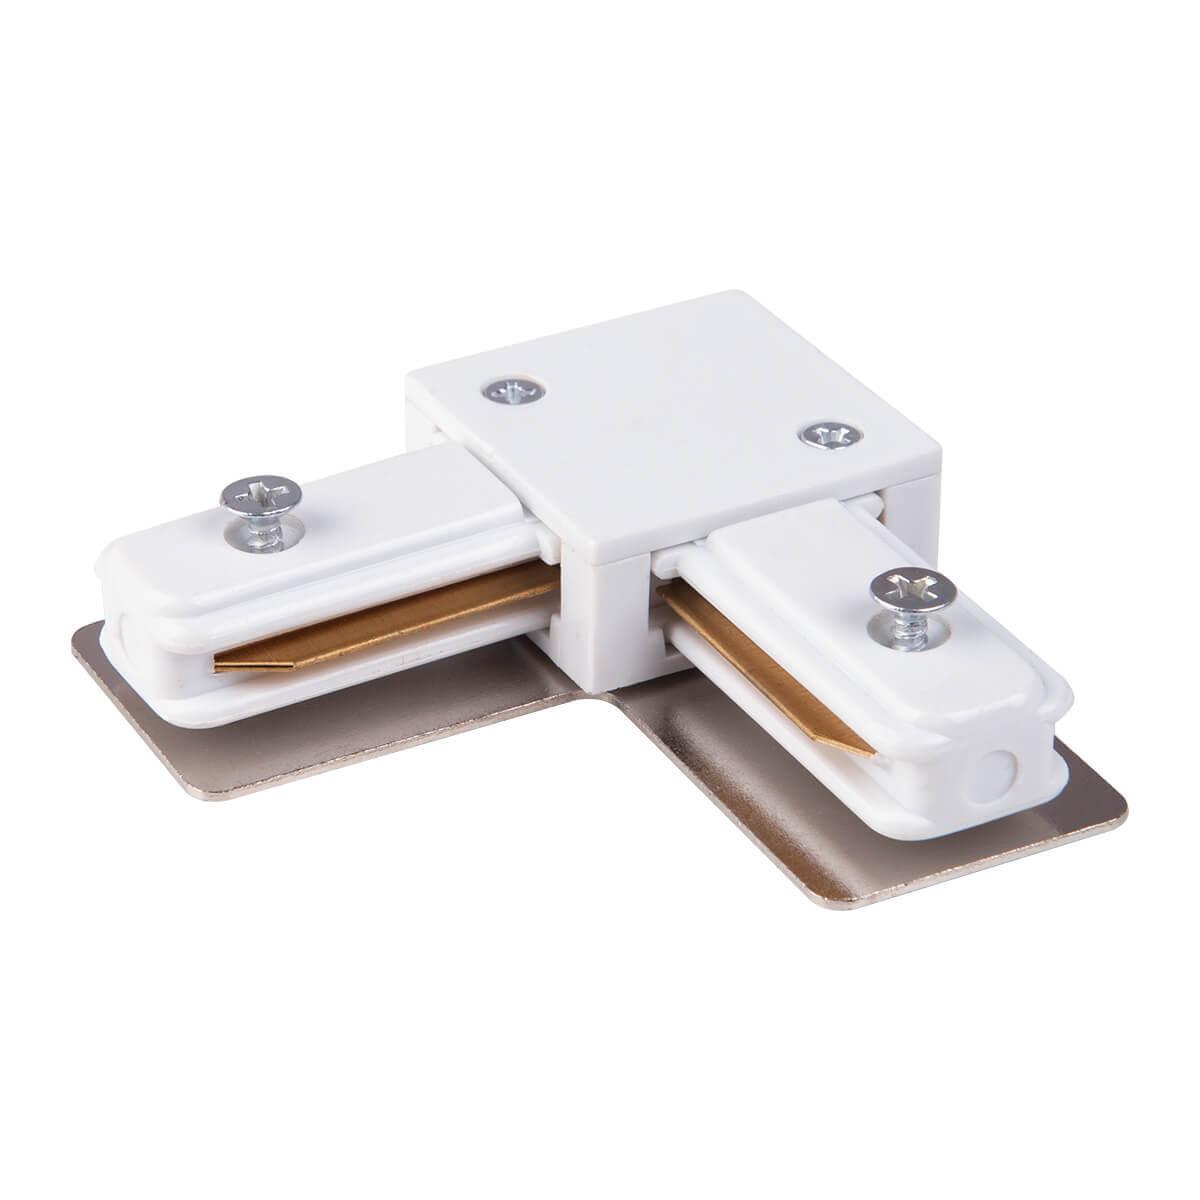 Коннектор Elektrostandard 4690389112355 TRL-1-1 (для однофазного шинопровода) шинопровод elektrostandard 4690389134302 trl 1 1